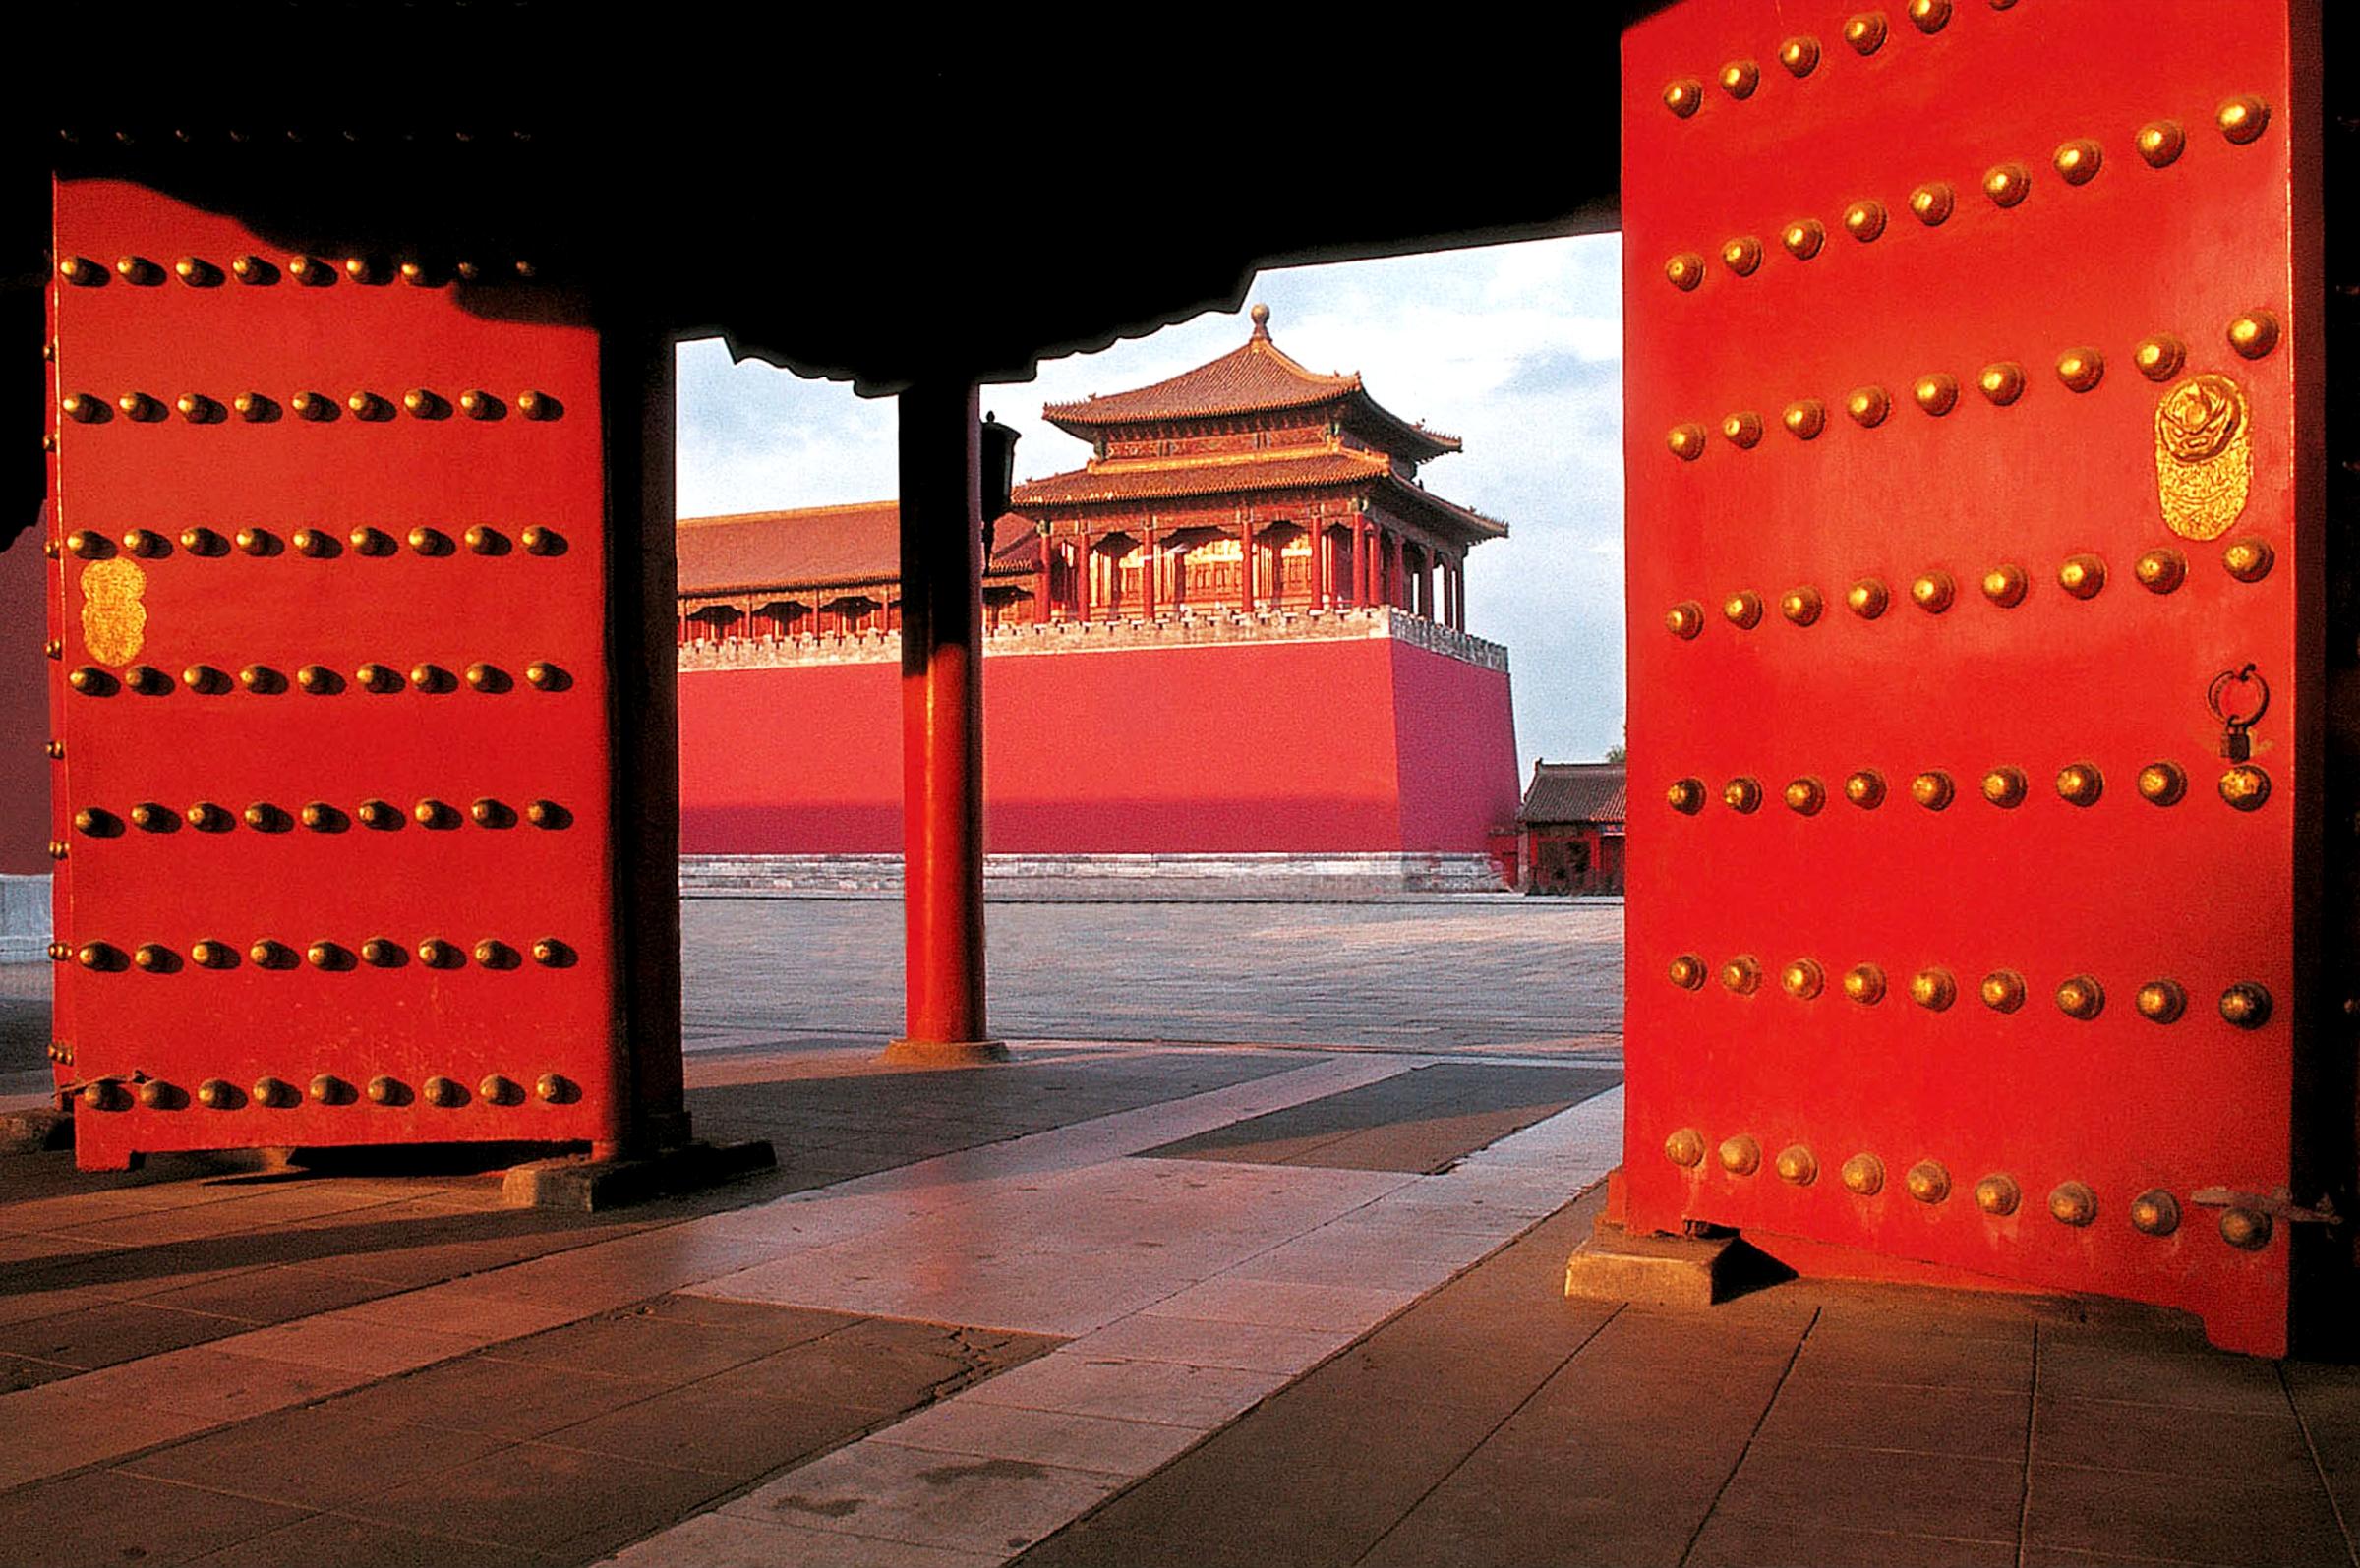 1.故宫-封面 Couverture